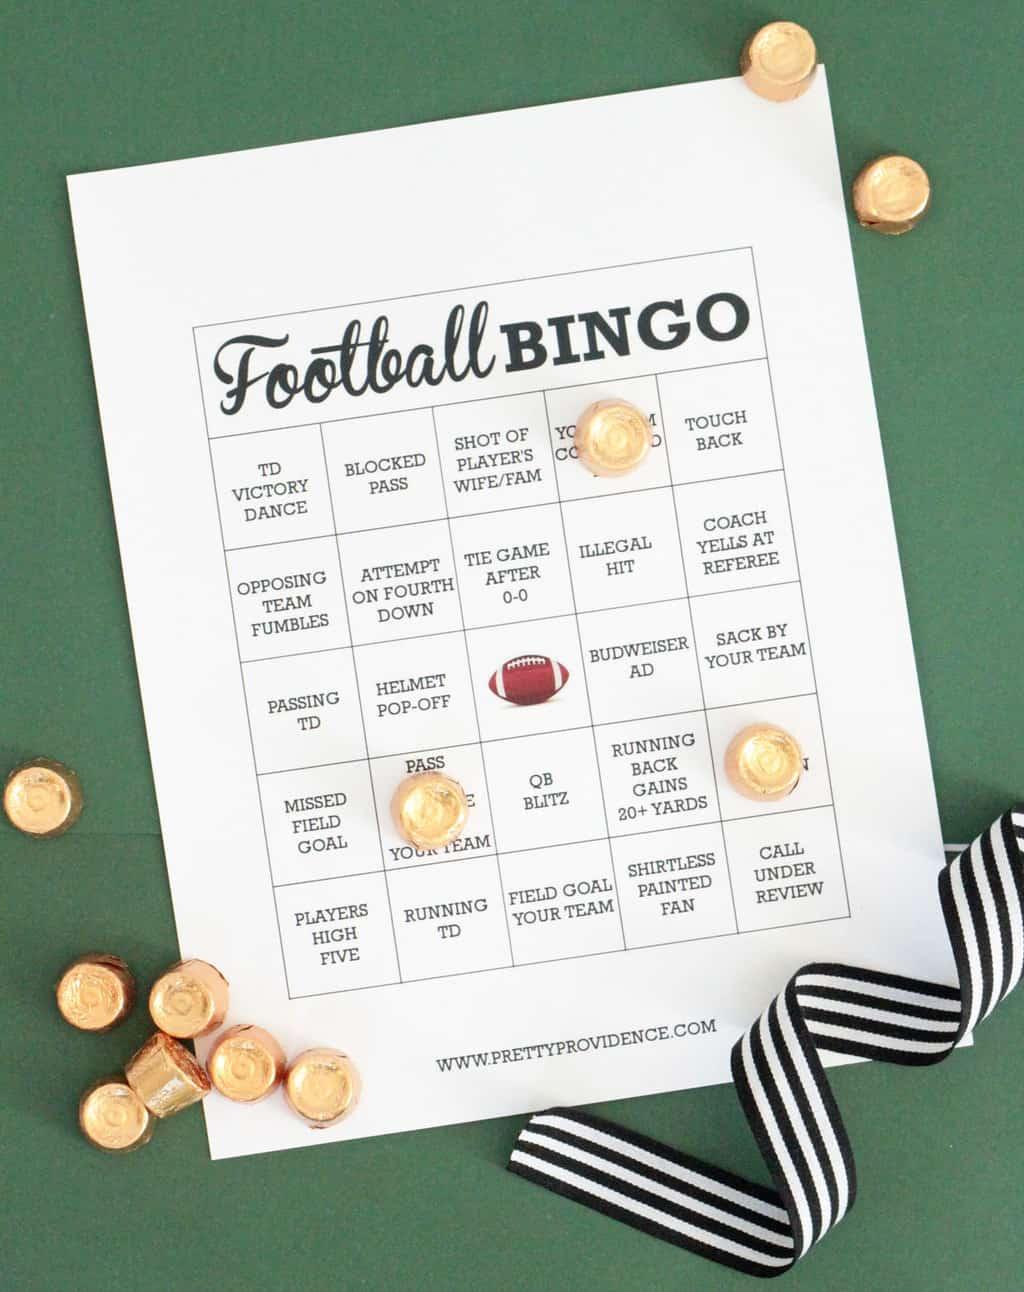 Free Printable Football Bingo Cards - Pretty Providence